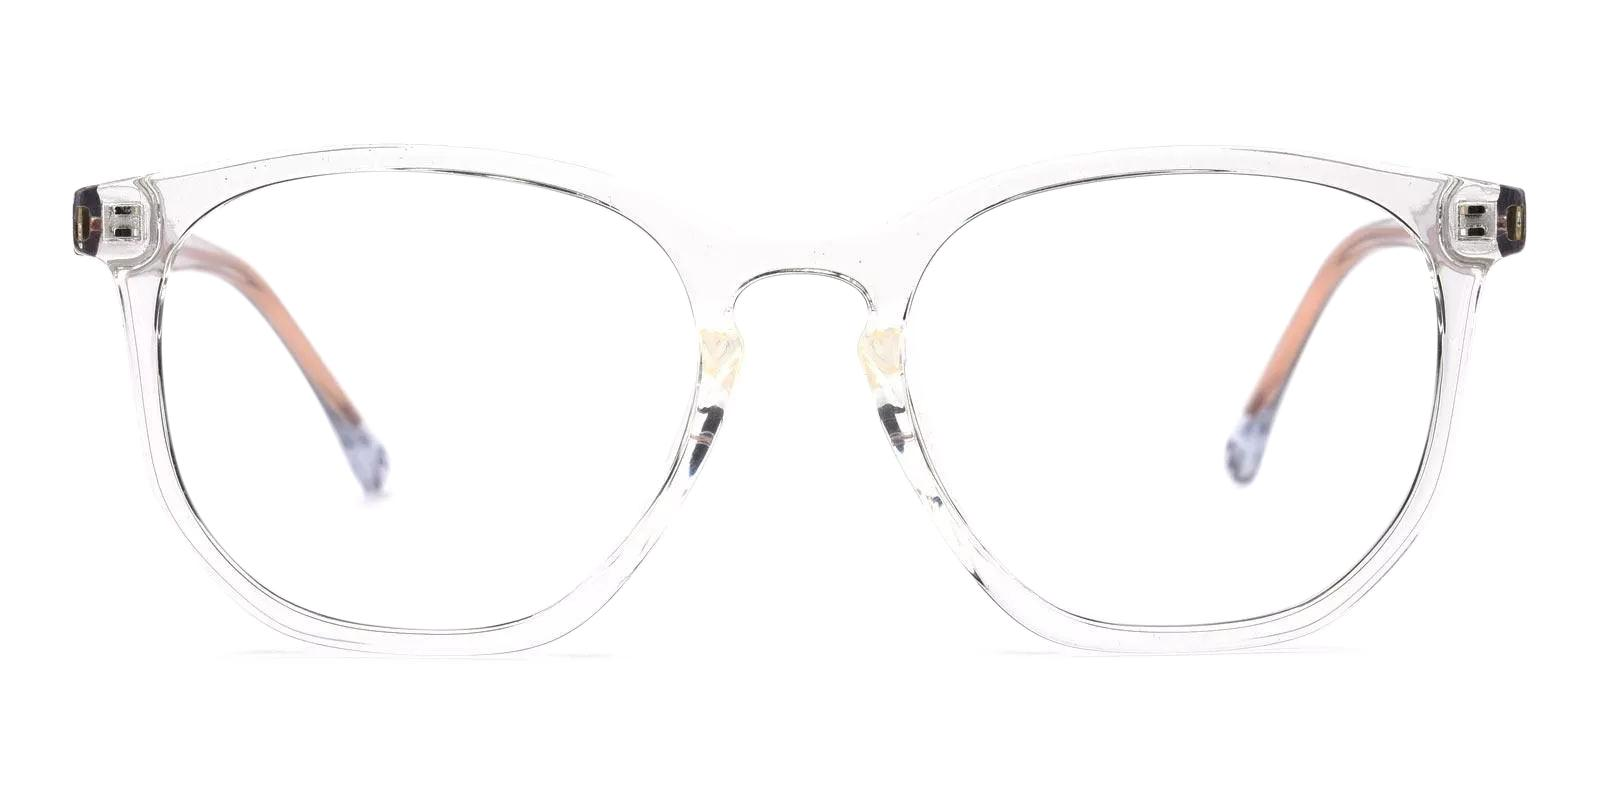 Russell Translucent TR Eyeglasses , Fashion , UniversalBridgeFit Frames from ABBE Glasses